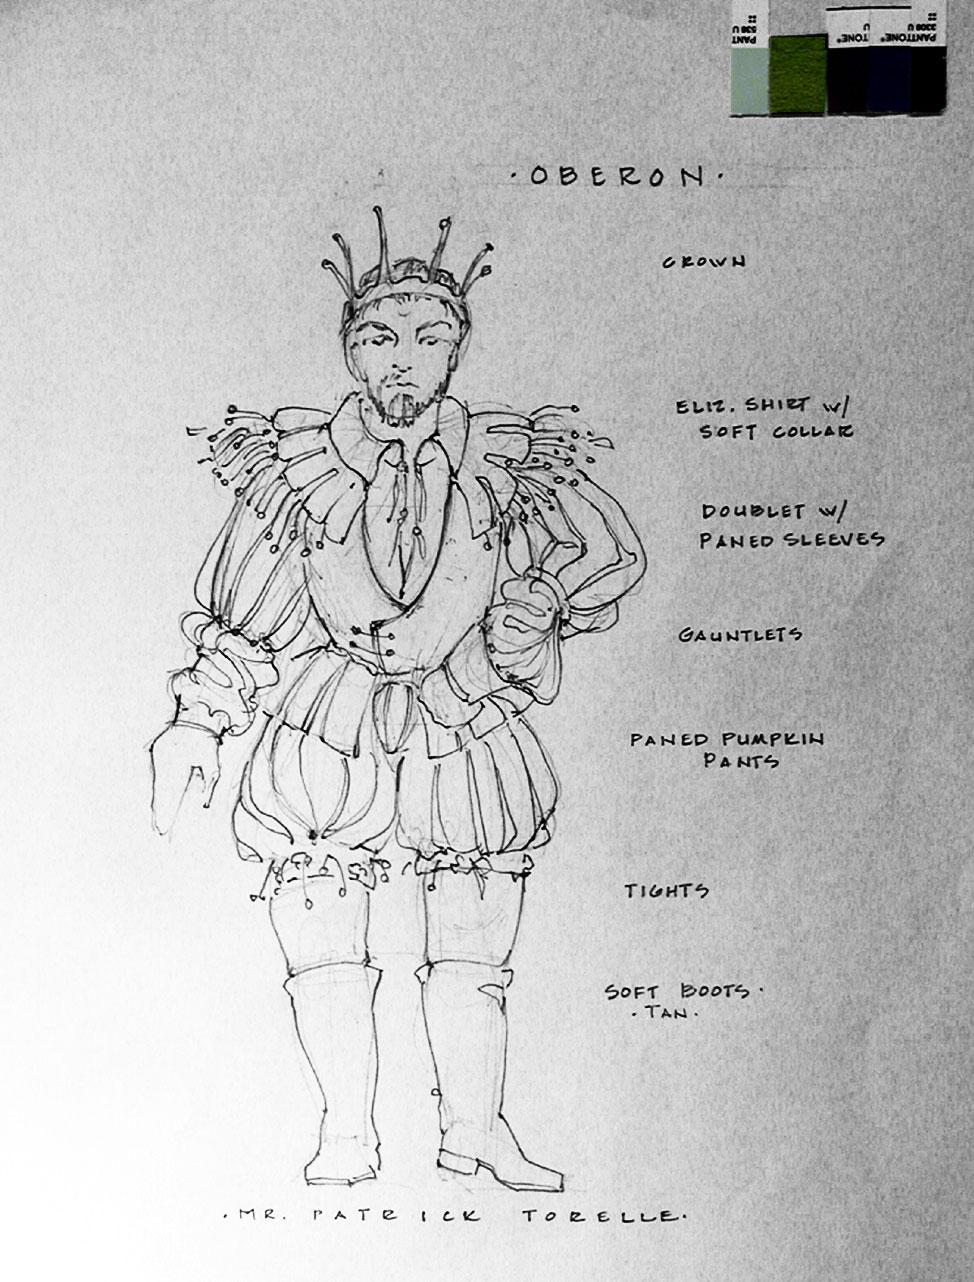 midsummer-nights-dream-oberon-costume-design-michael-ganio.jpg